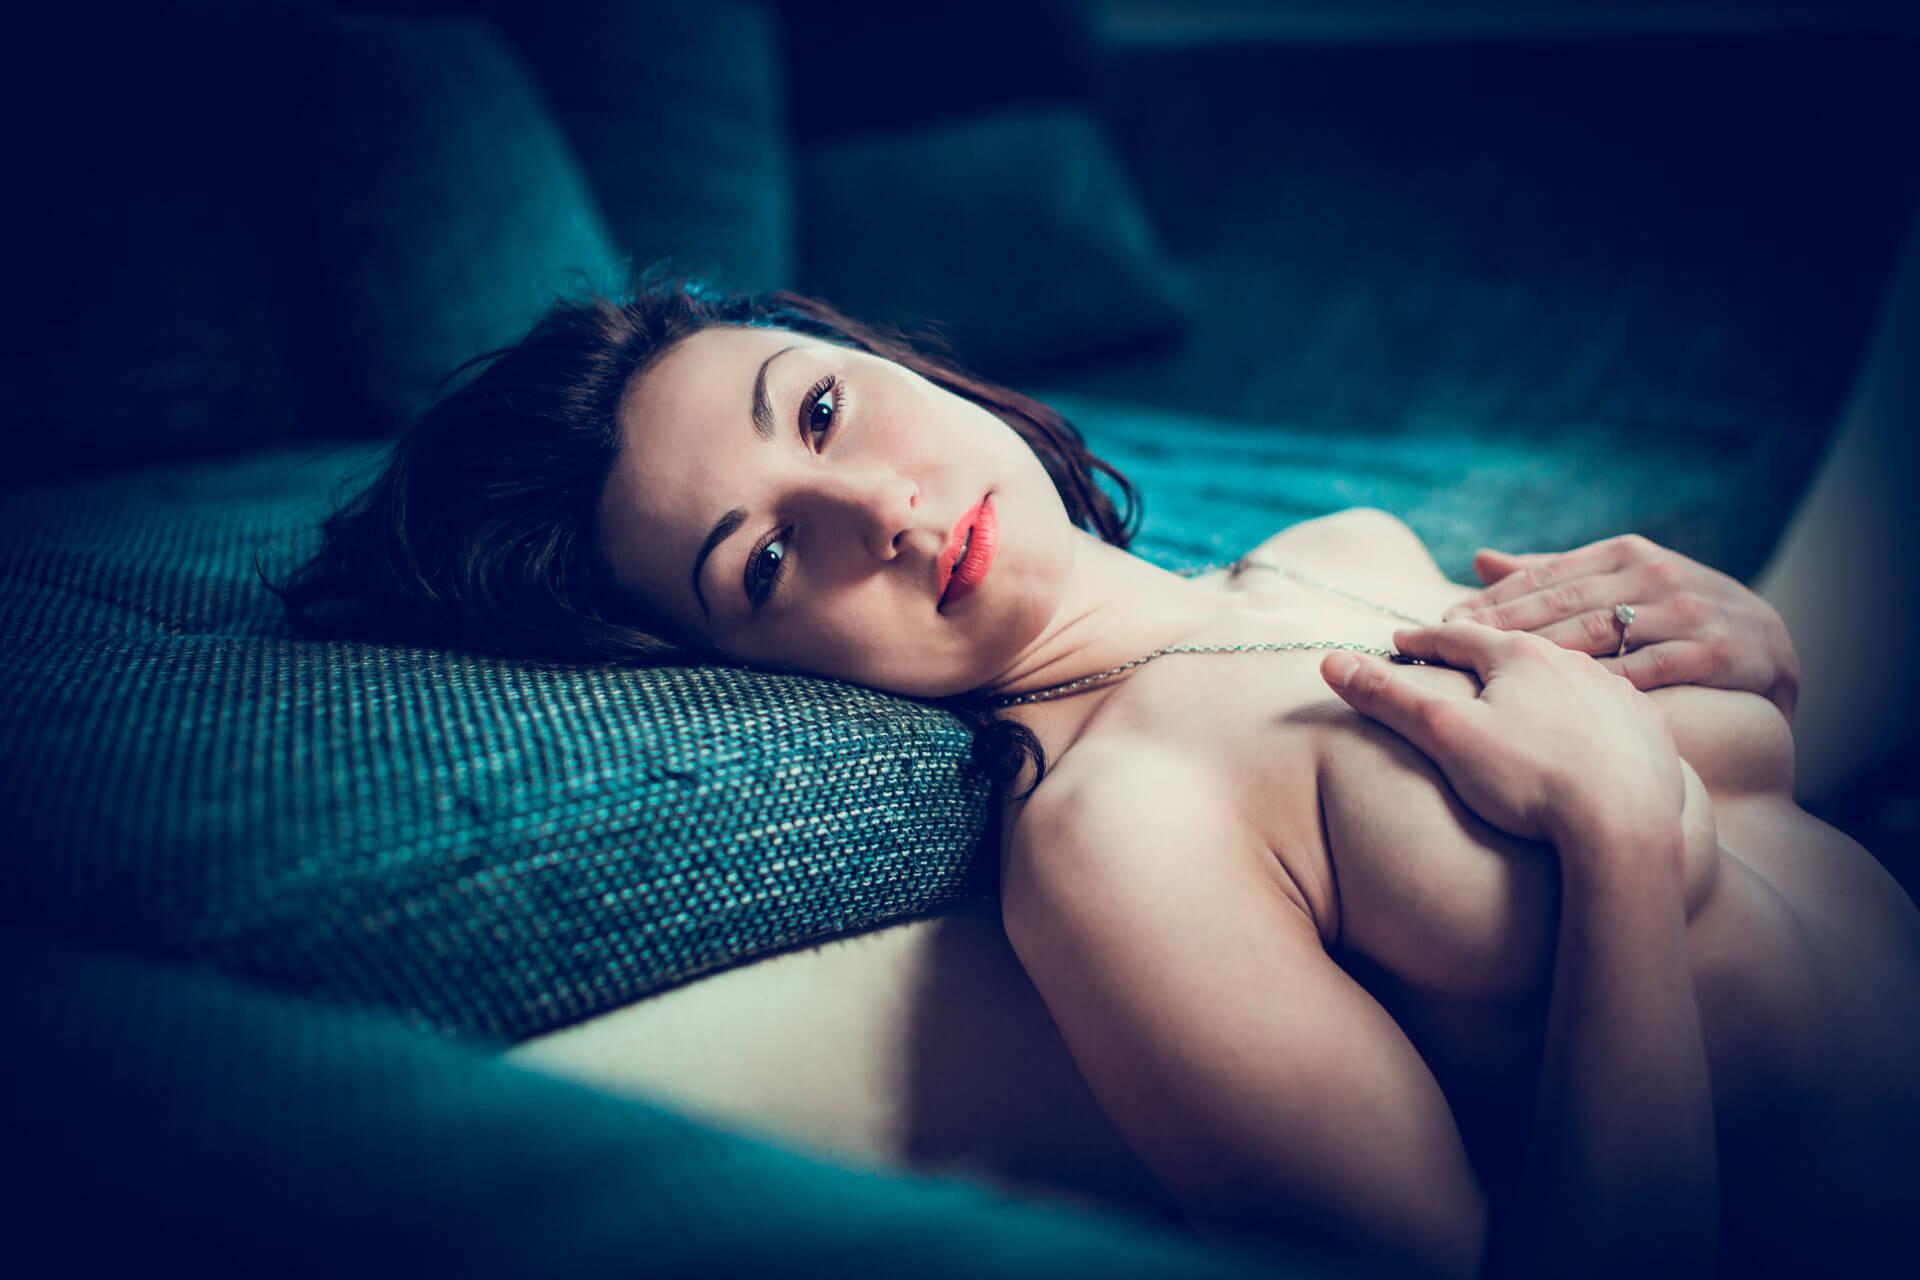 studio-homeshooting-akt-nude-dessous-model-shooting-srose-fotografie